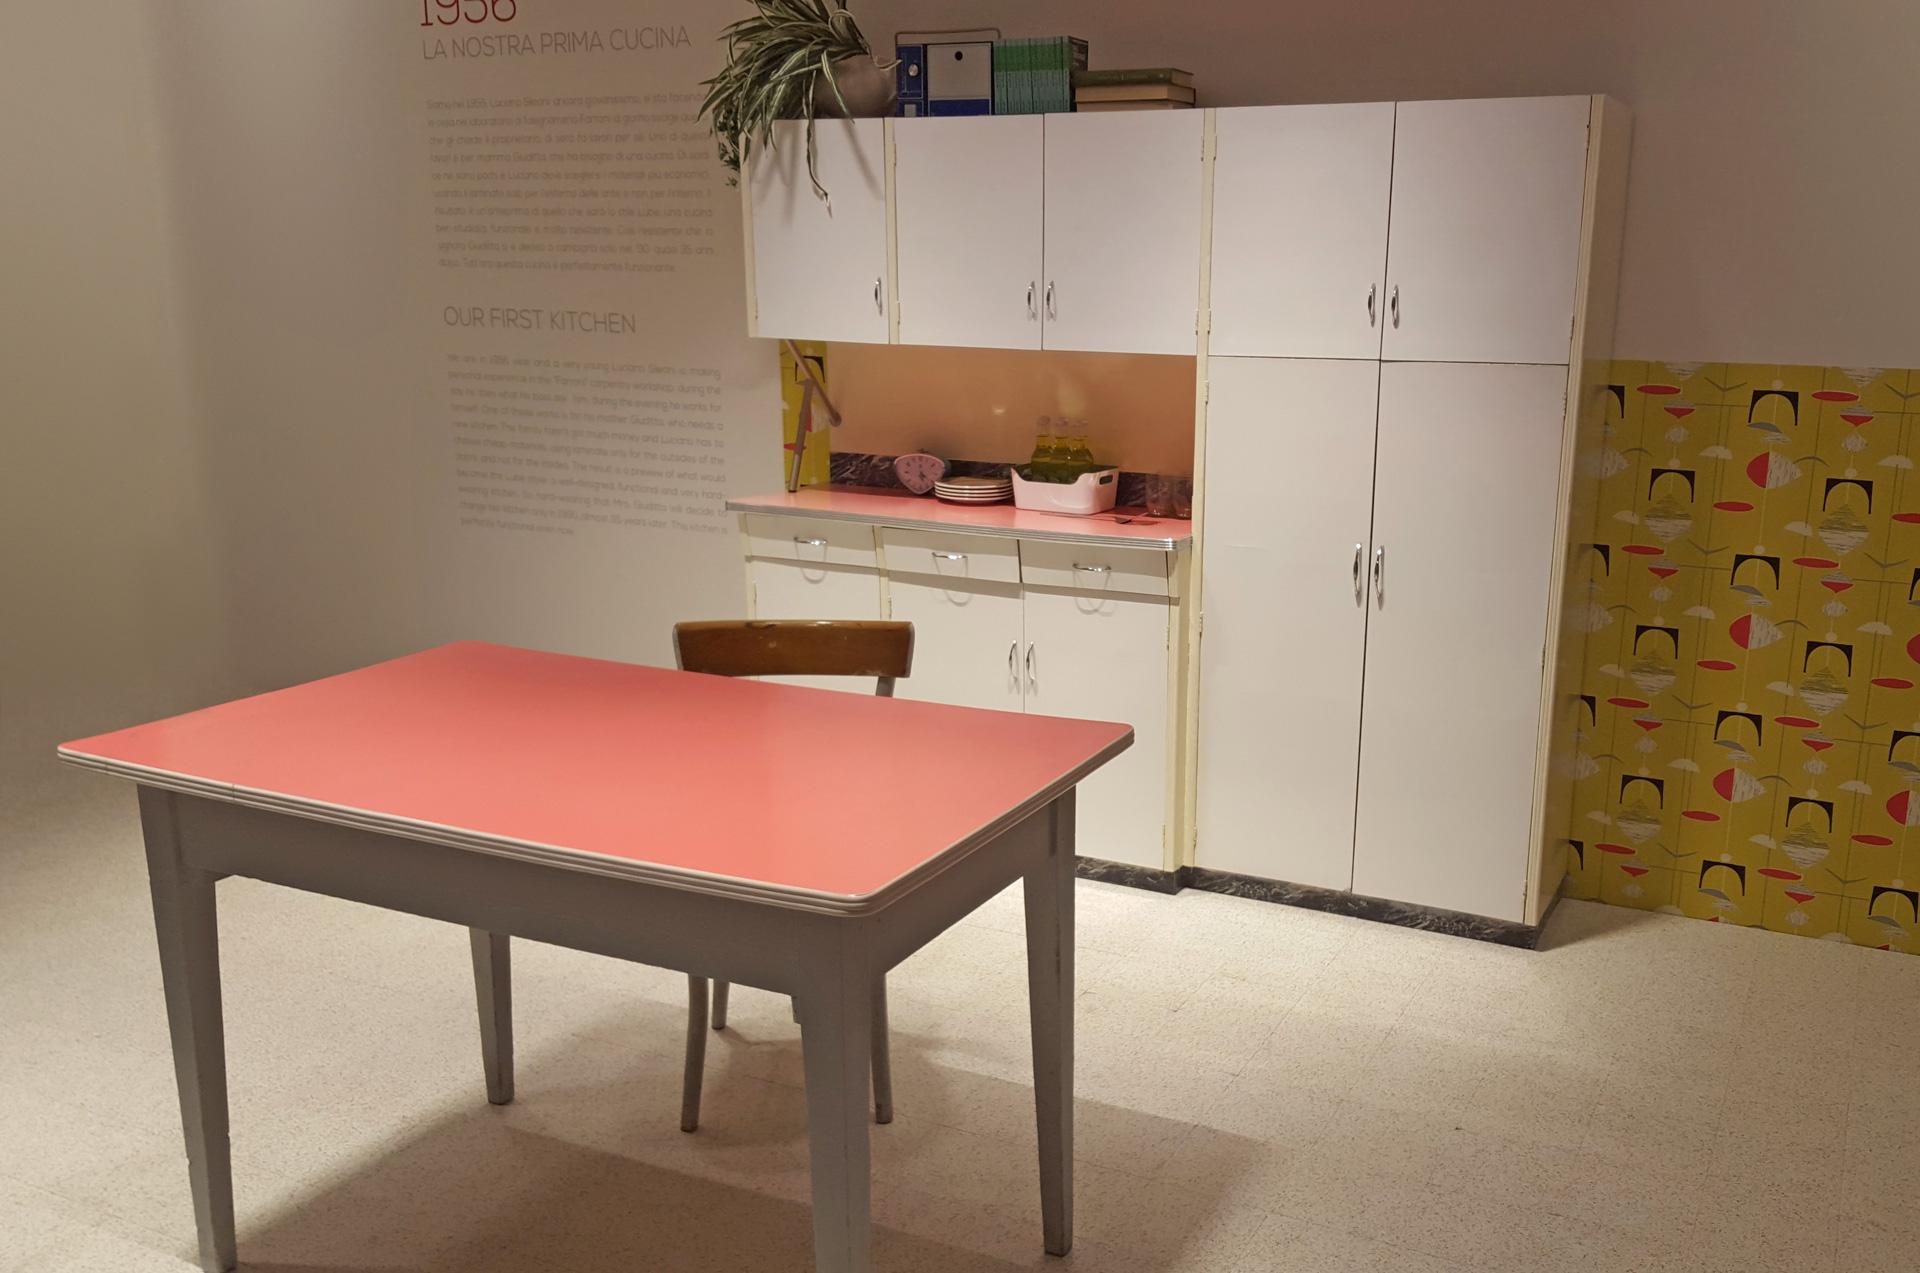 GruppoLUBE - Creo Kitchens